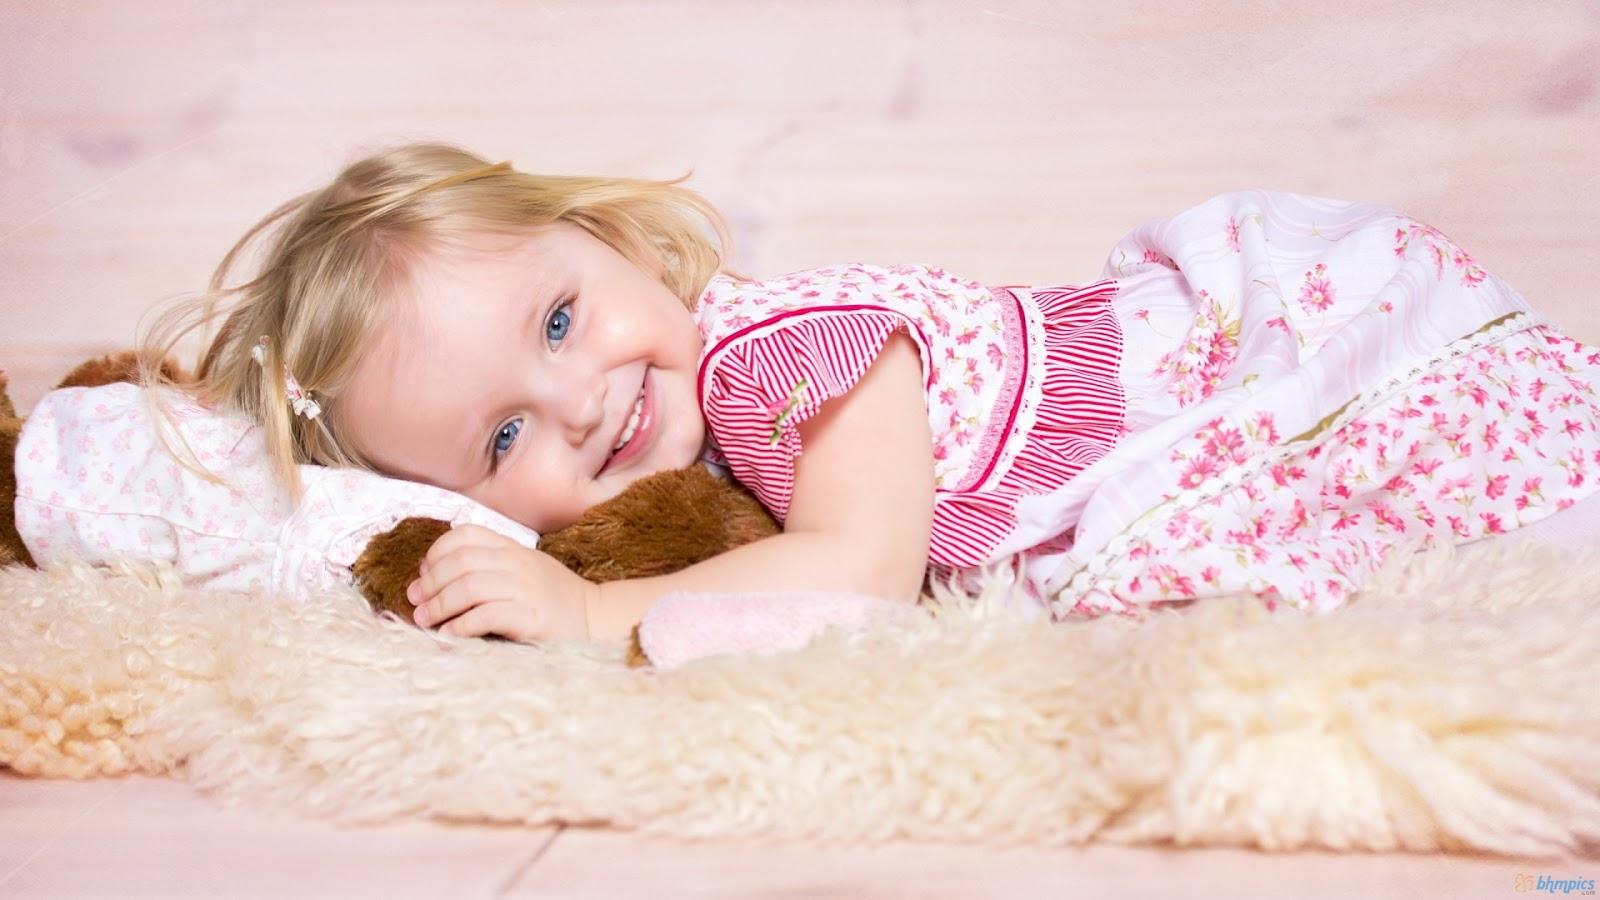 Cute Smiling Baby Girl HD Wallpaper | Cute Little Babies